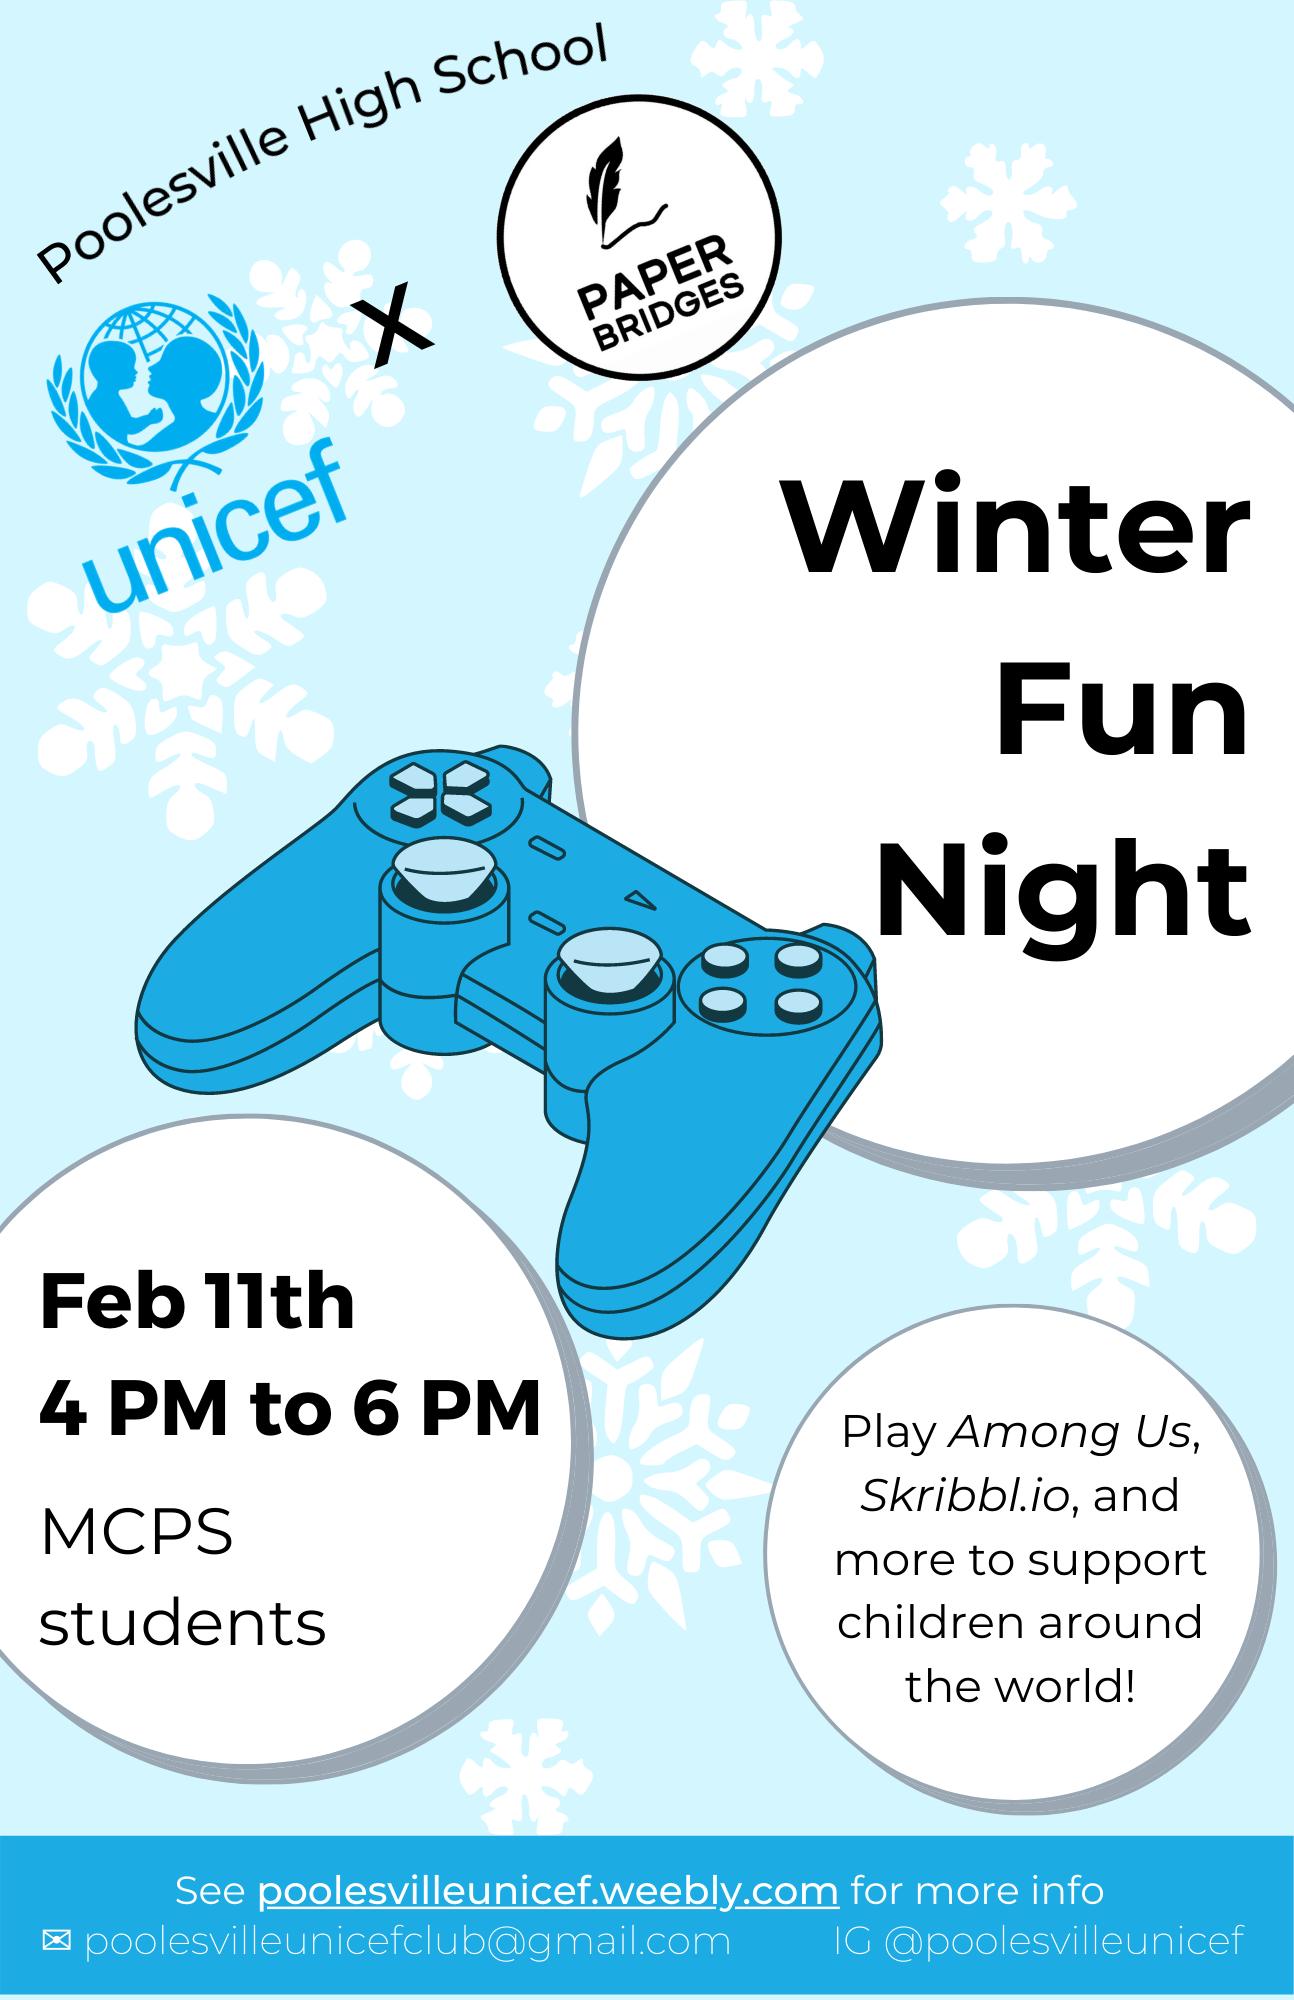 Poolesville High School UNICEF x Paper Bridges Winter Fun Night